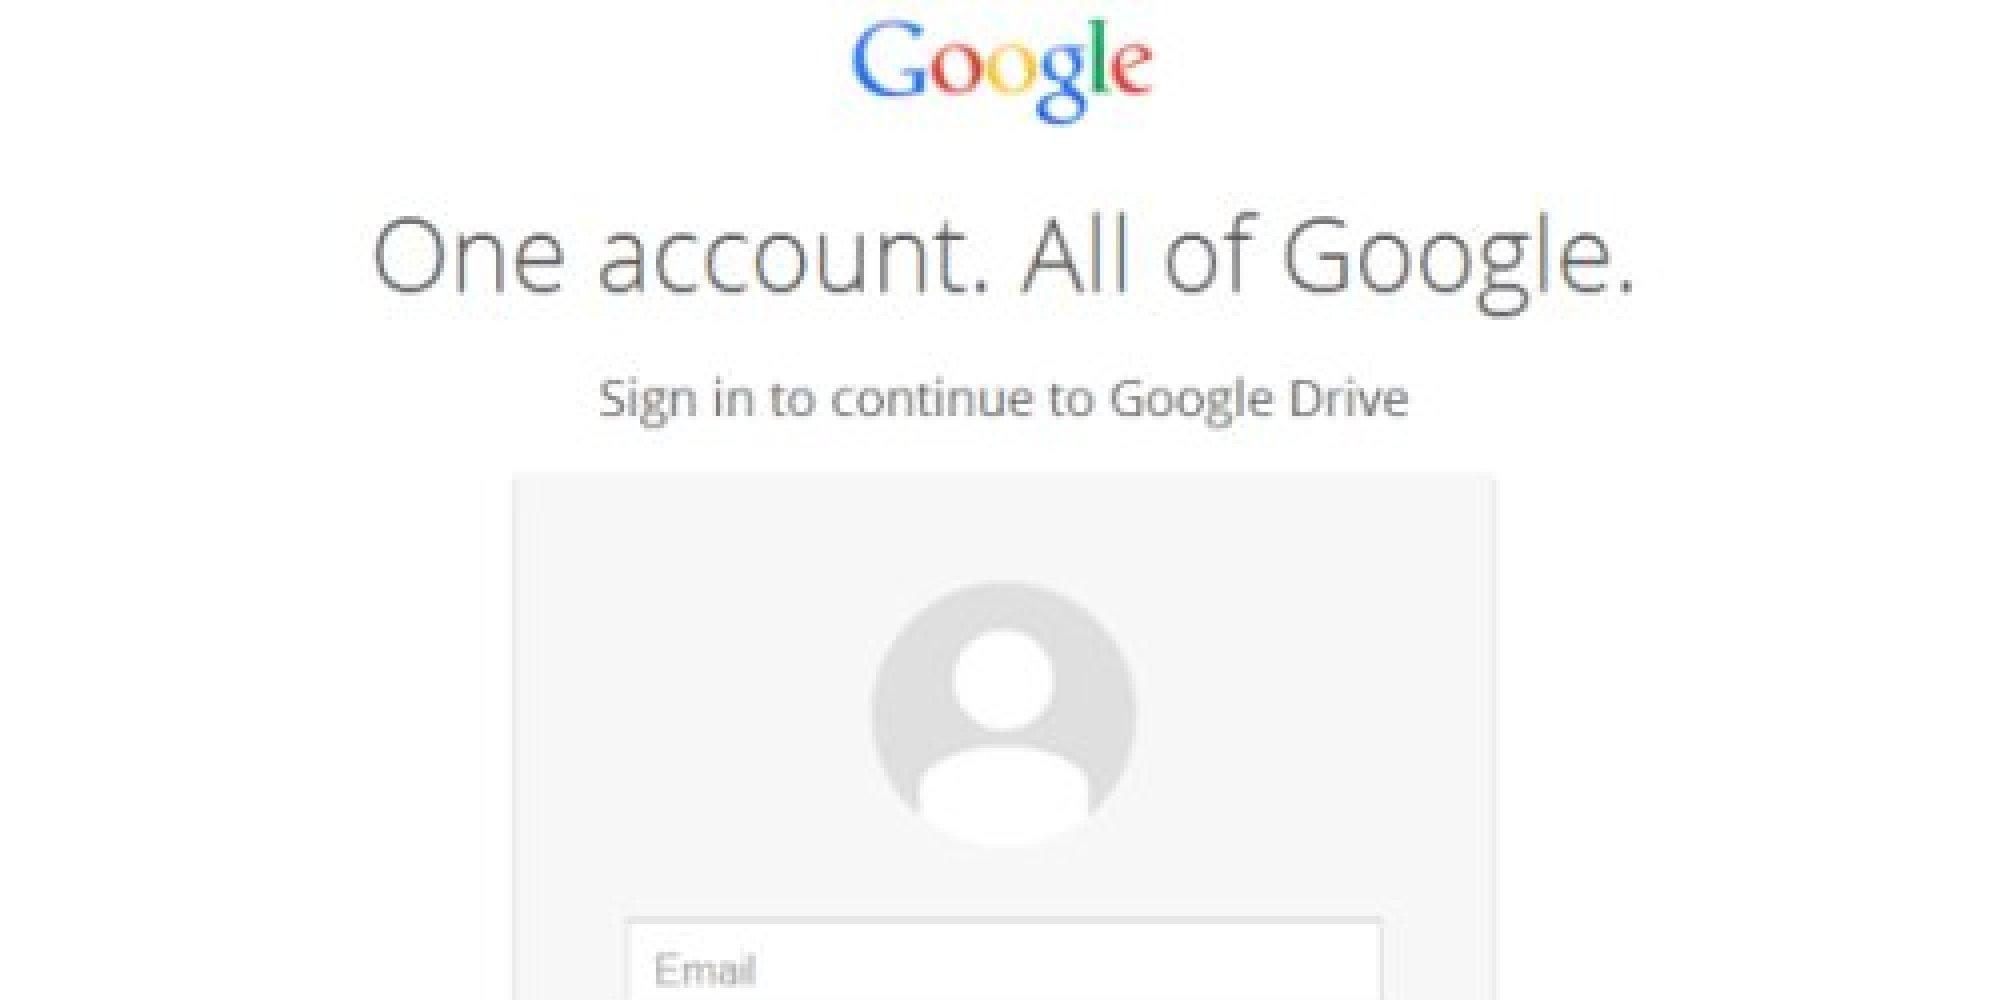 Google Email Sign In Download Google Login Email Page Google Chrome Gmail  Login Page Gmail How